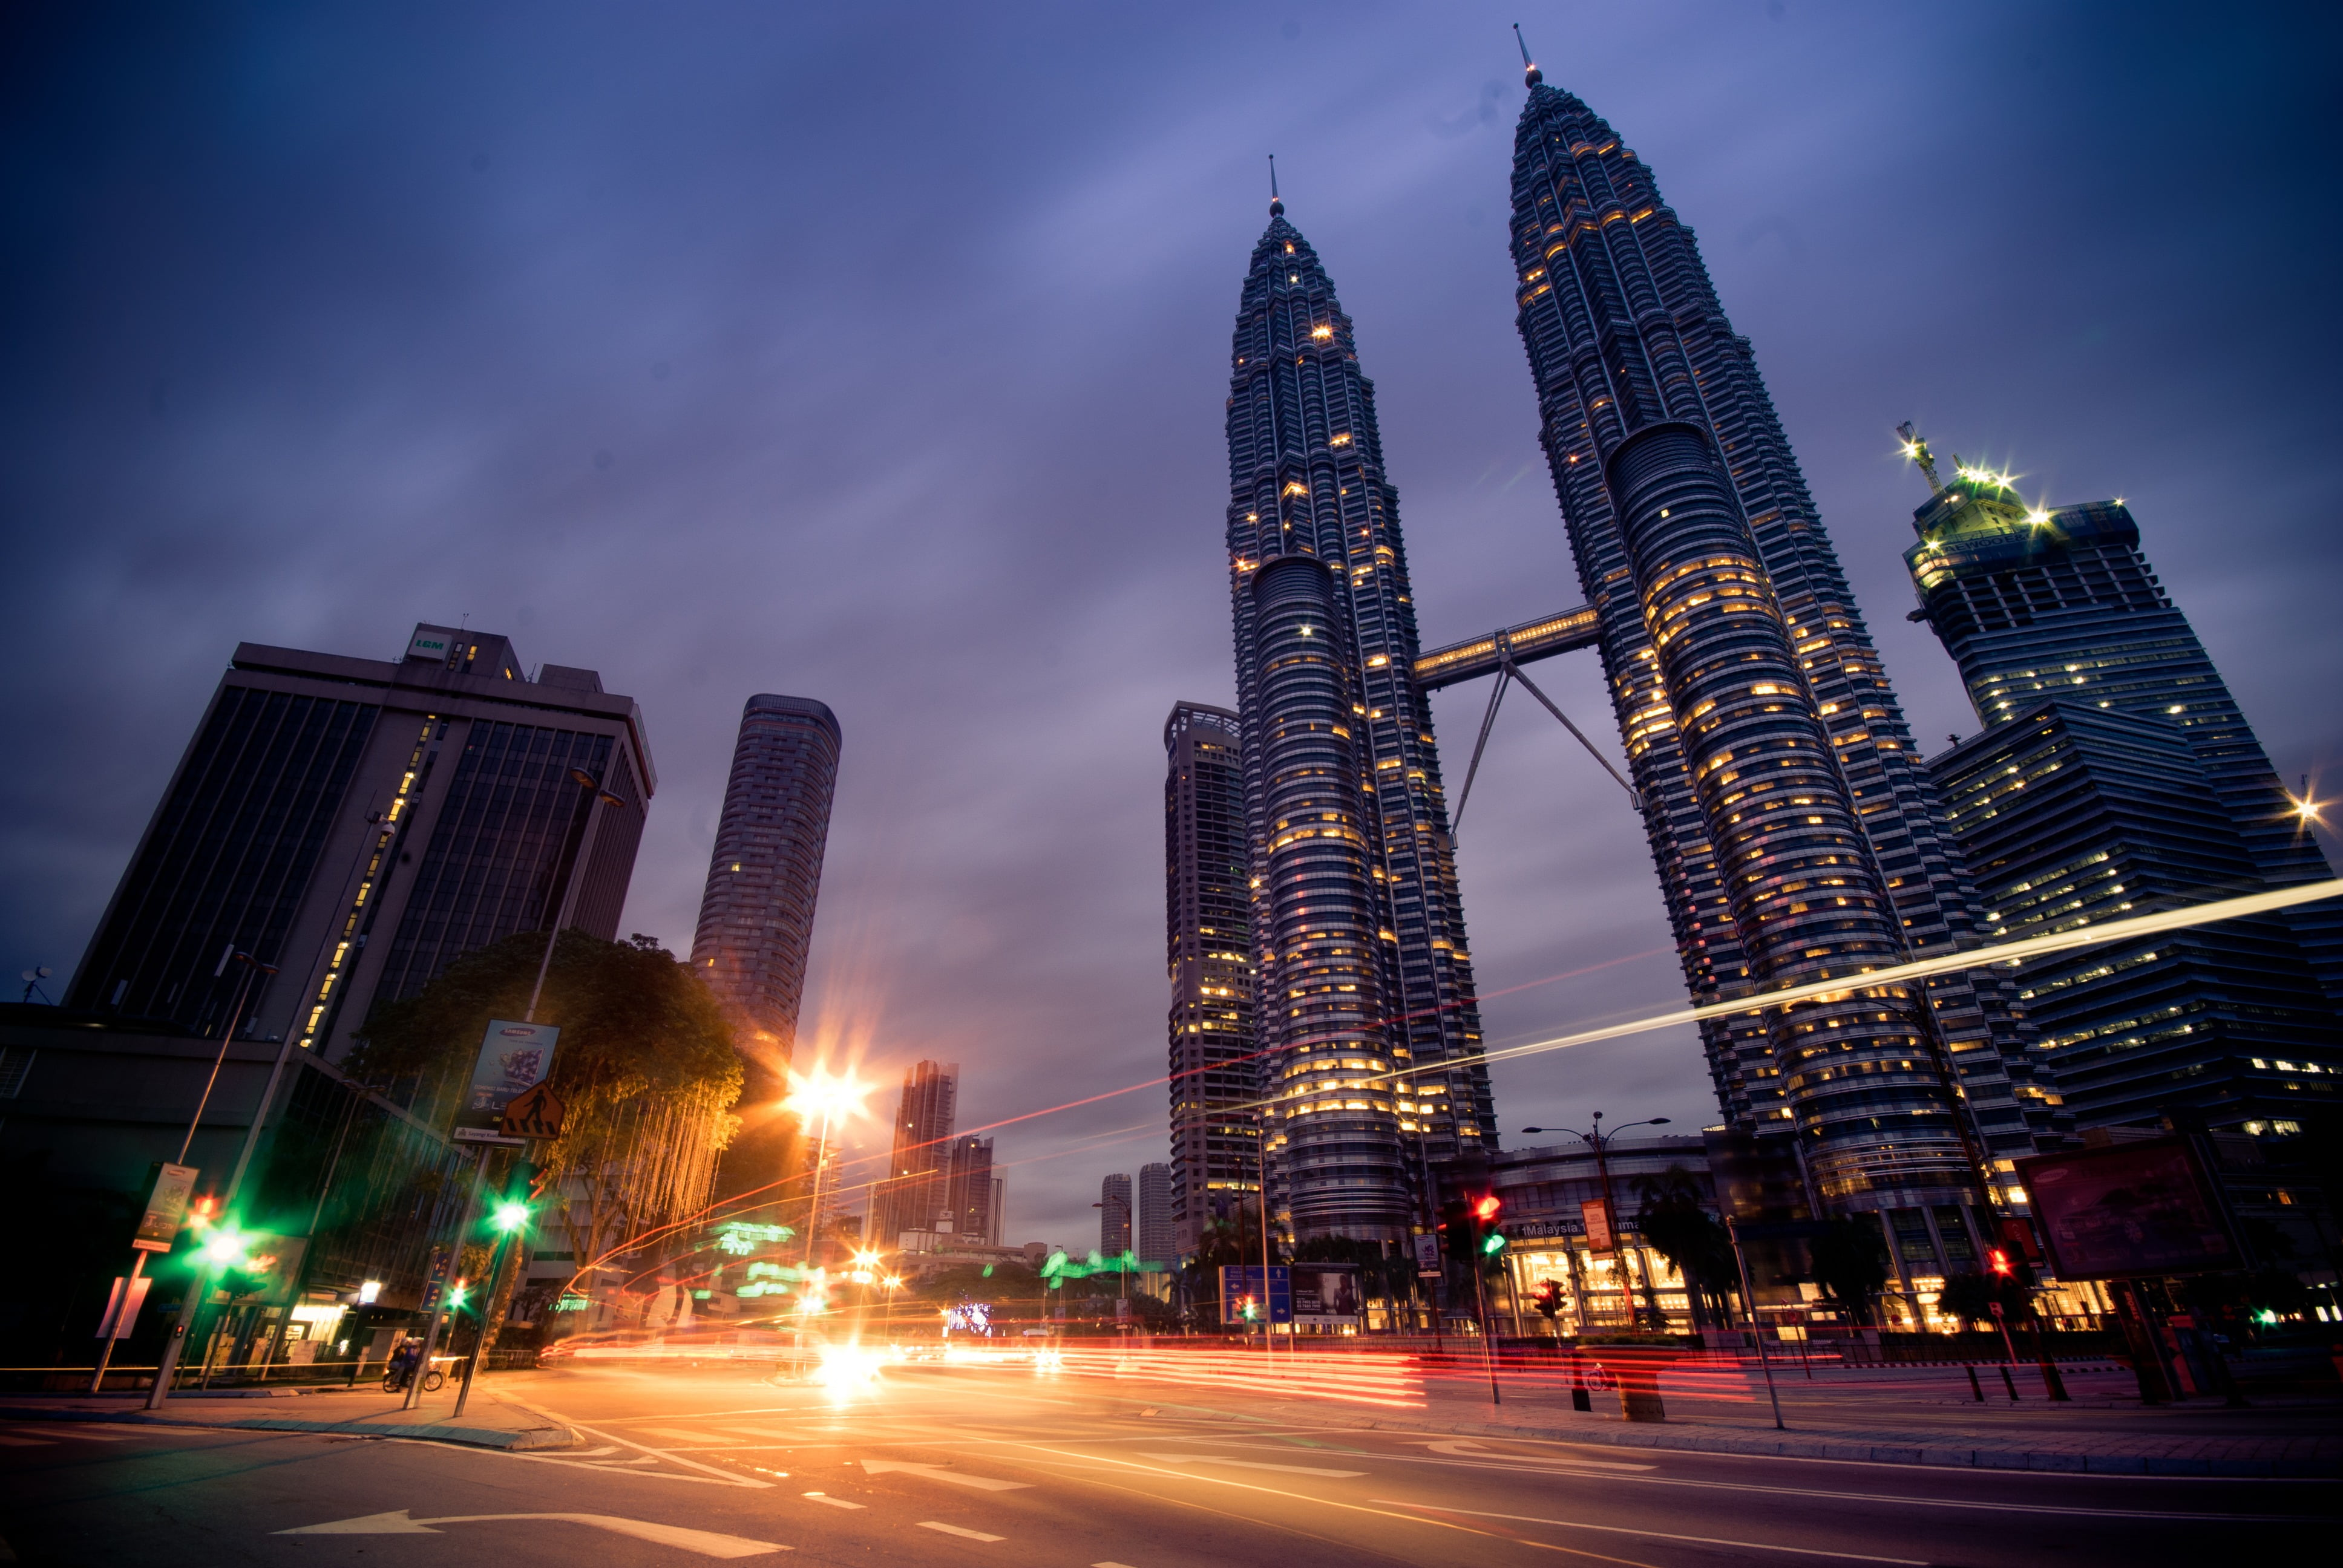 kuala-lumpur-petronas-twin-towers-malays